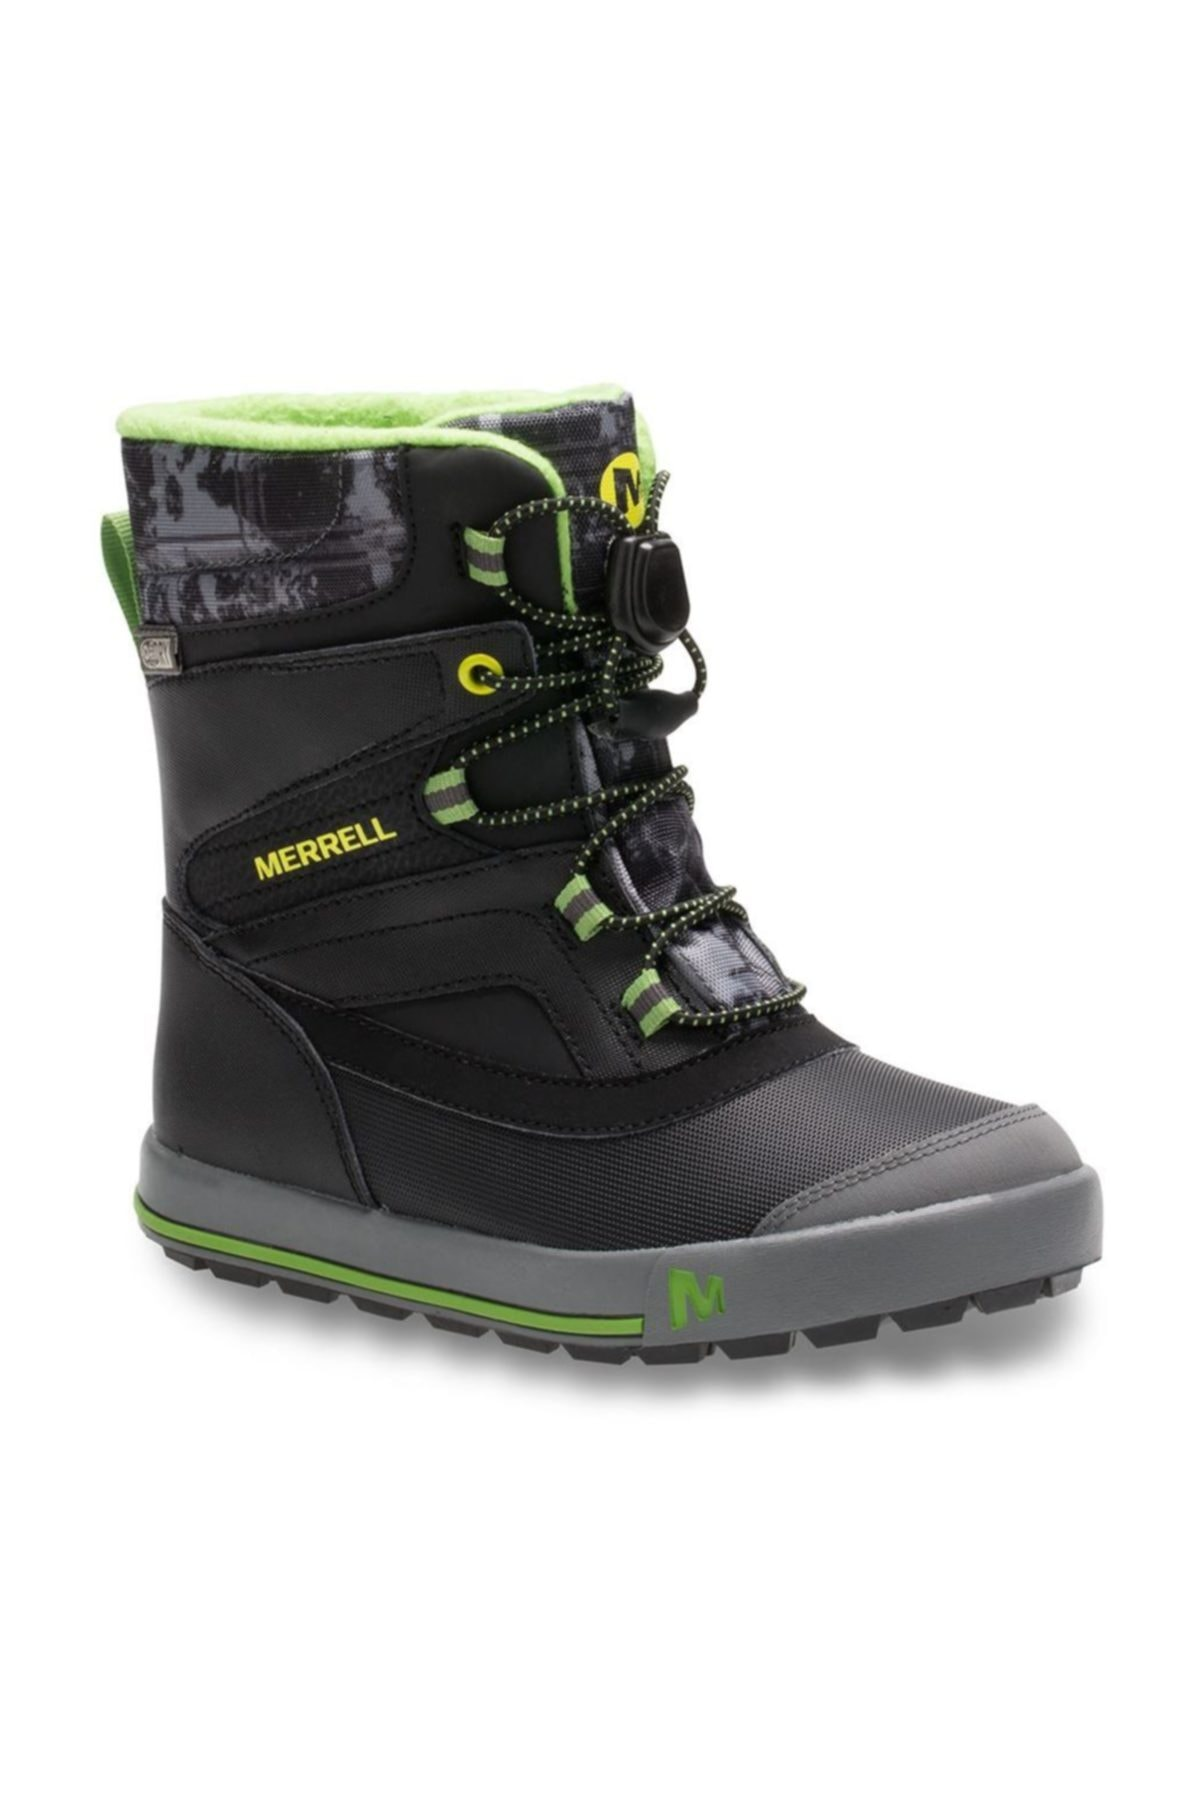 Merrell Çocuk Outdoor Ayakkabı Snow Bank 2.0 1